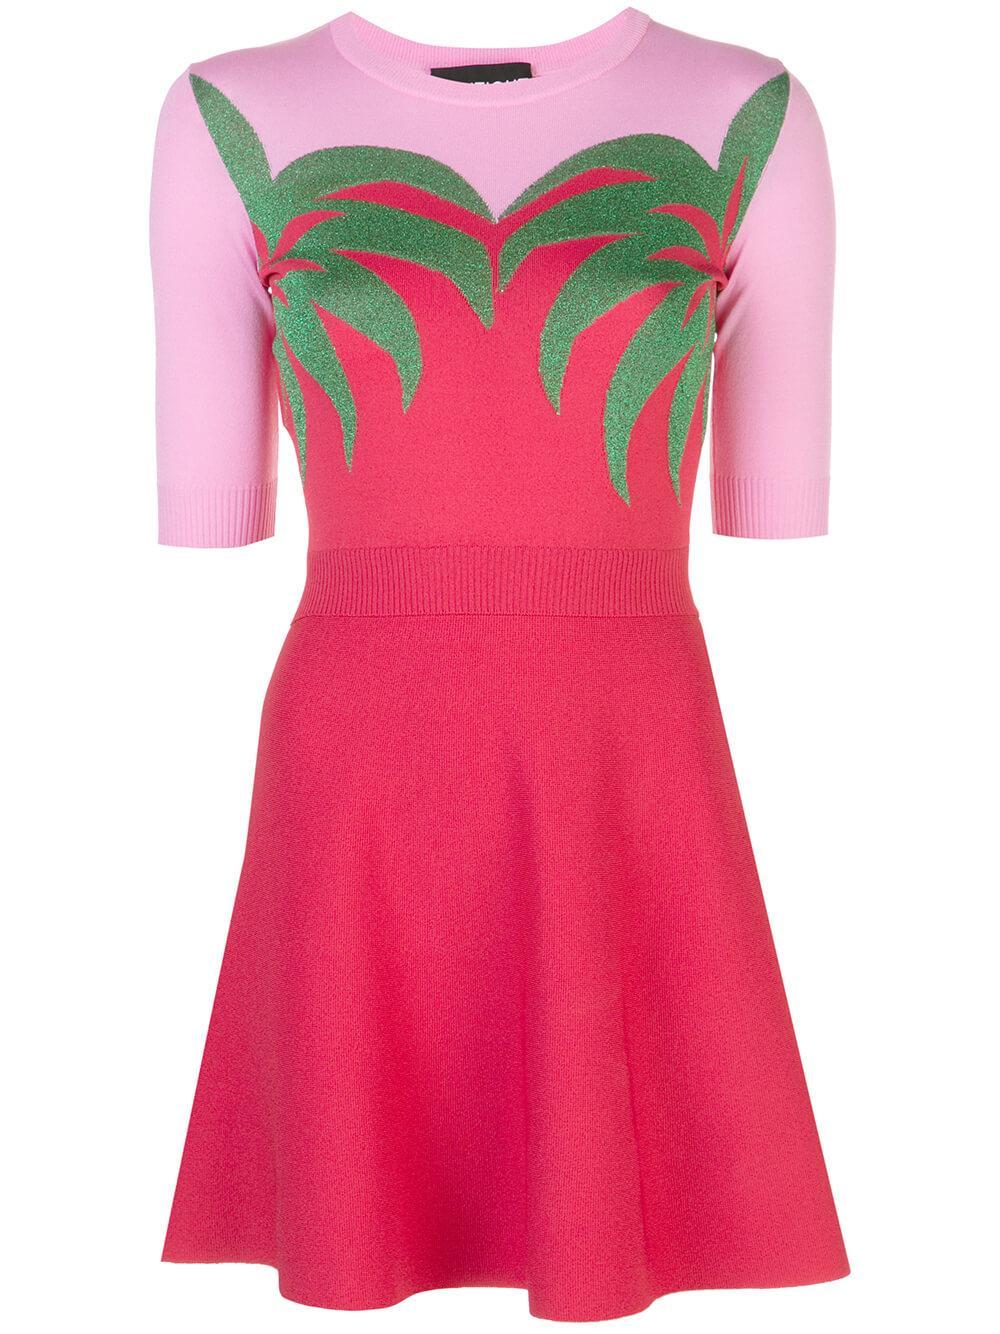 Elbow Sleeve Colorblock Dress Item # 0495-1102